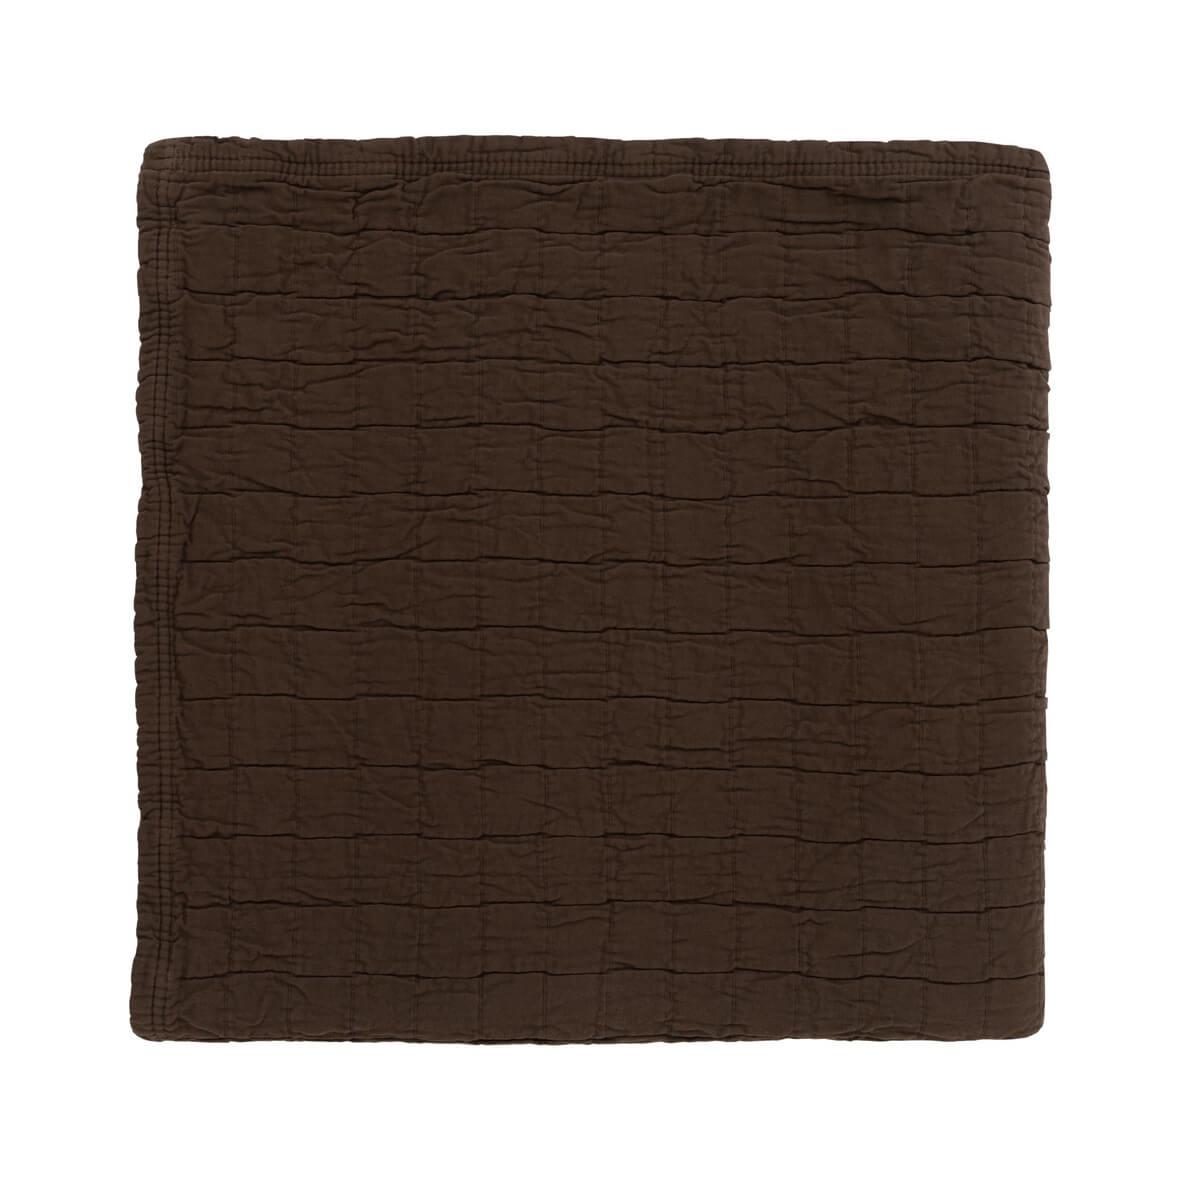 MATRI Aava bedspread choco